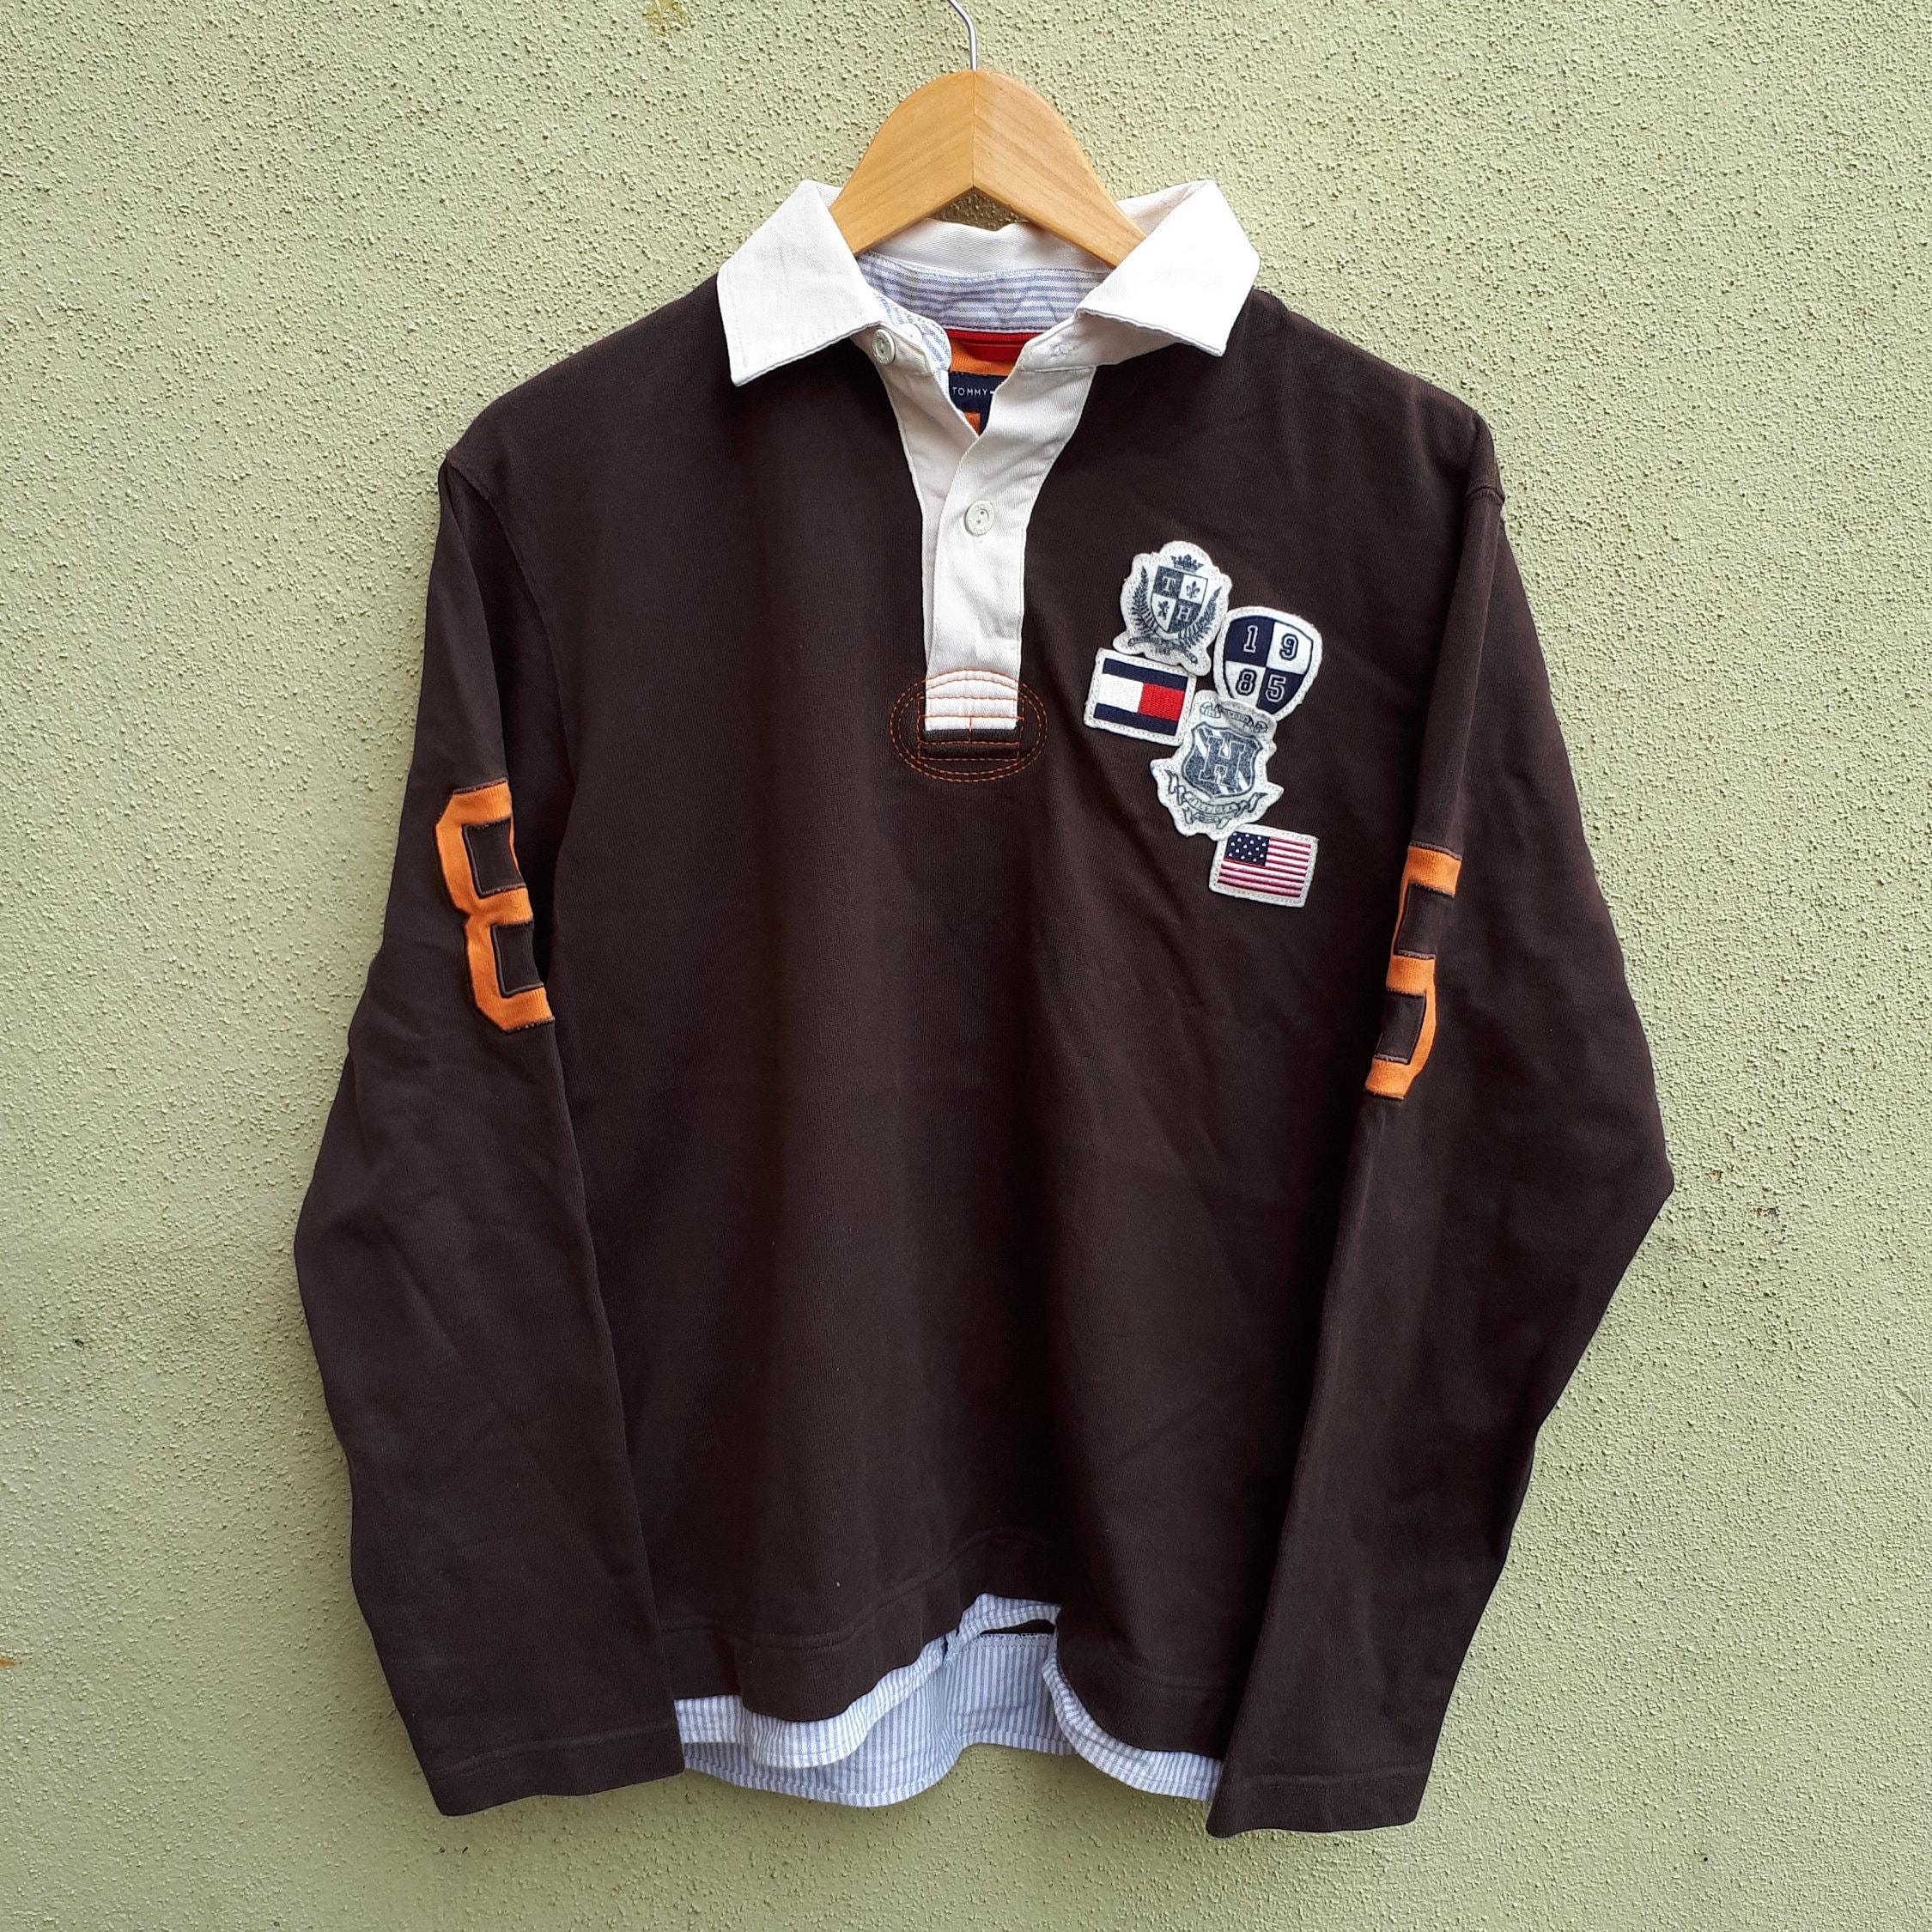 39b12e6ec Tommy Hilfiger Shirt Tommy Hilfiger 85 Long Sleeve Polo Rugby | Etsy